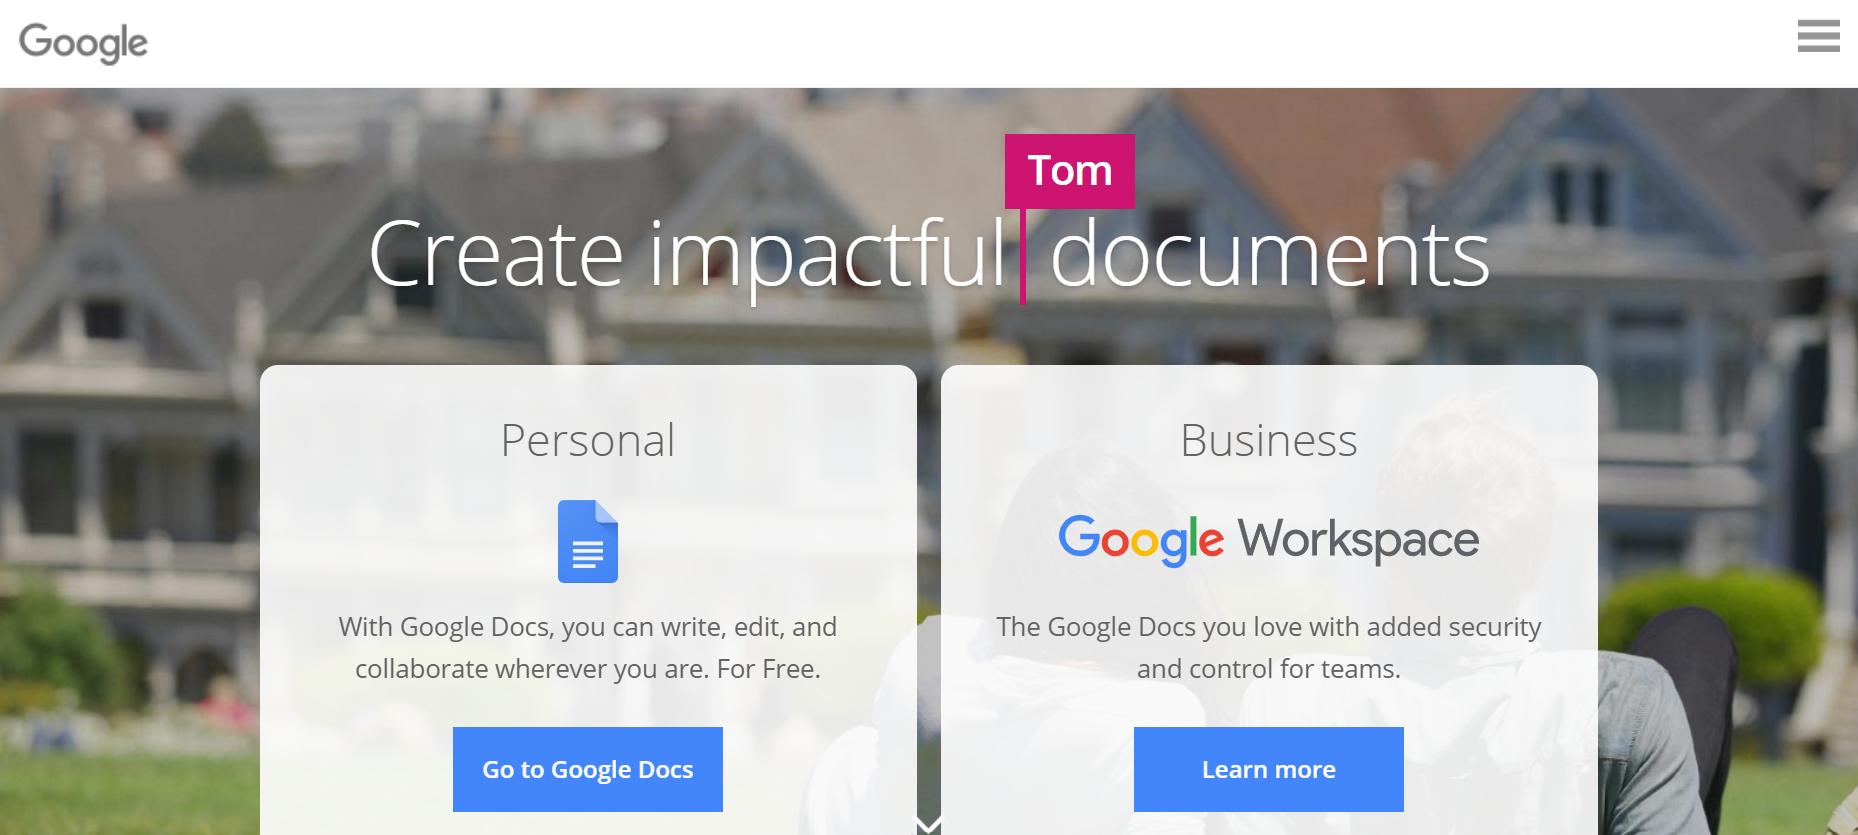 Google docs blogging tool for newbie cannabis writers homepage screenshot.